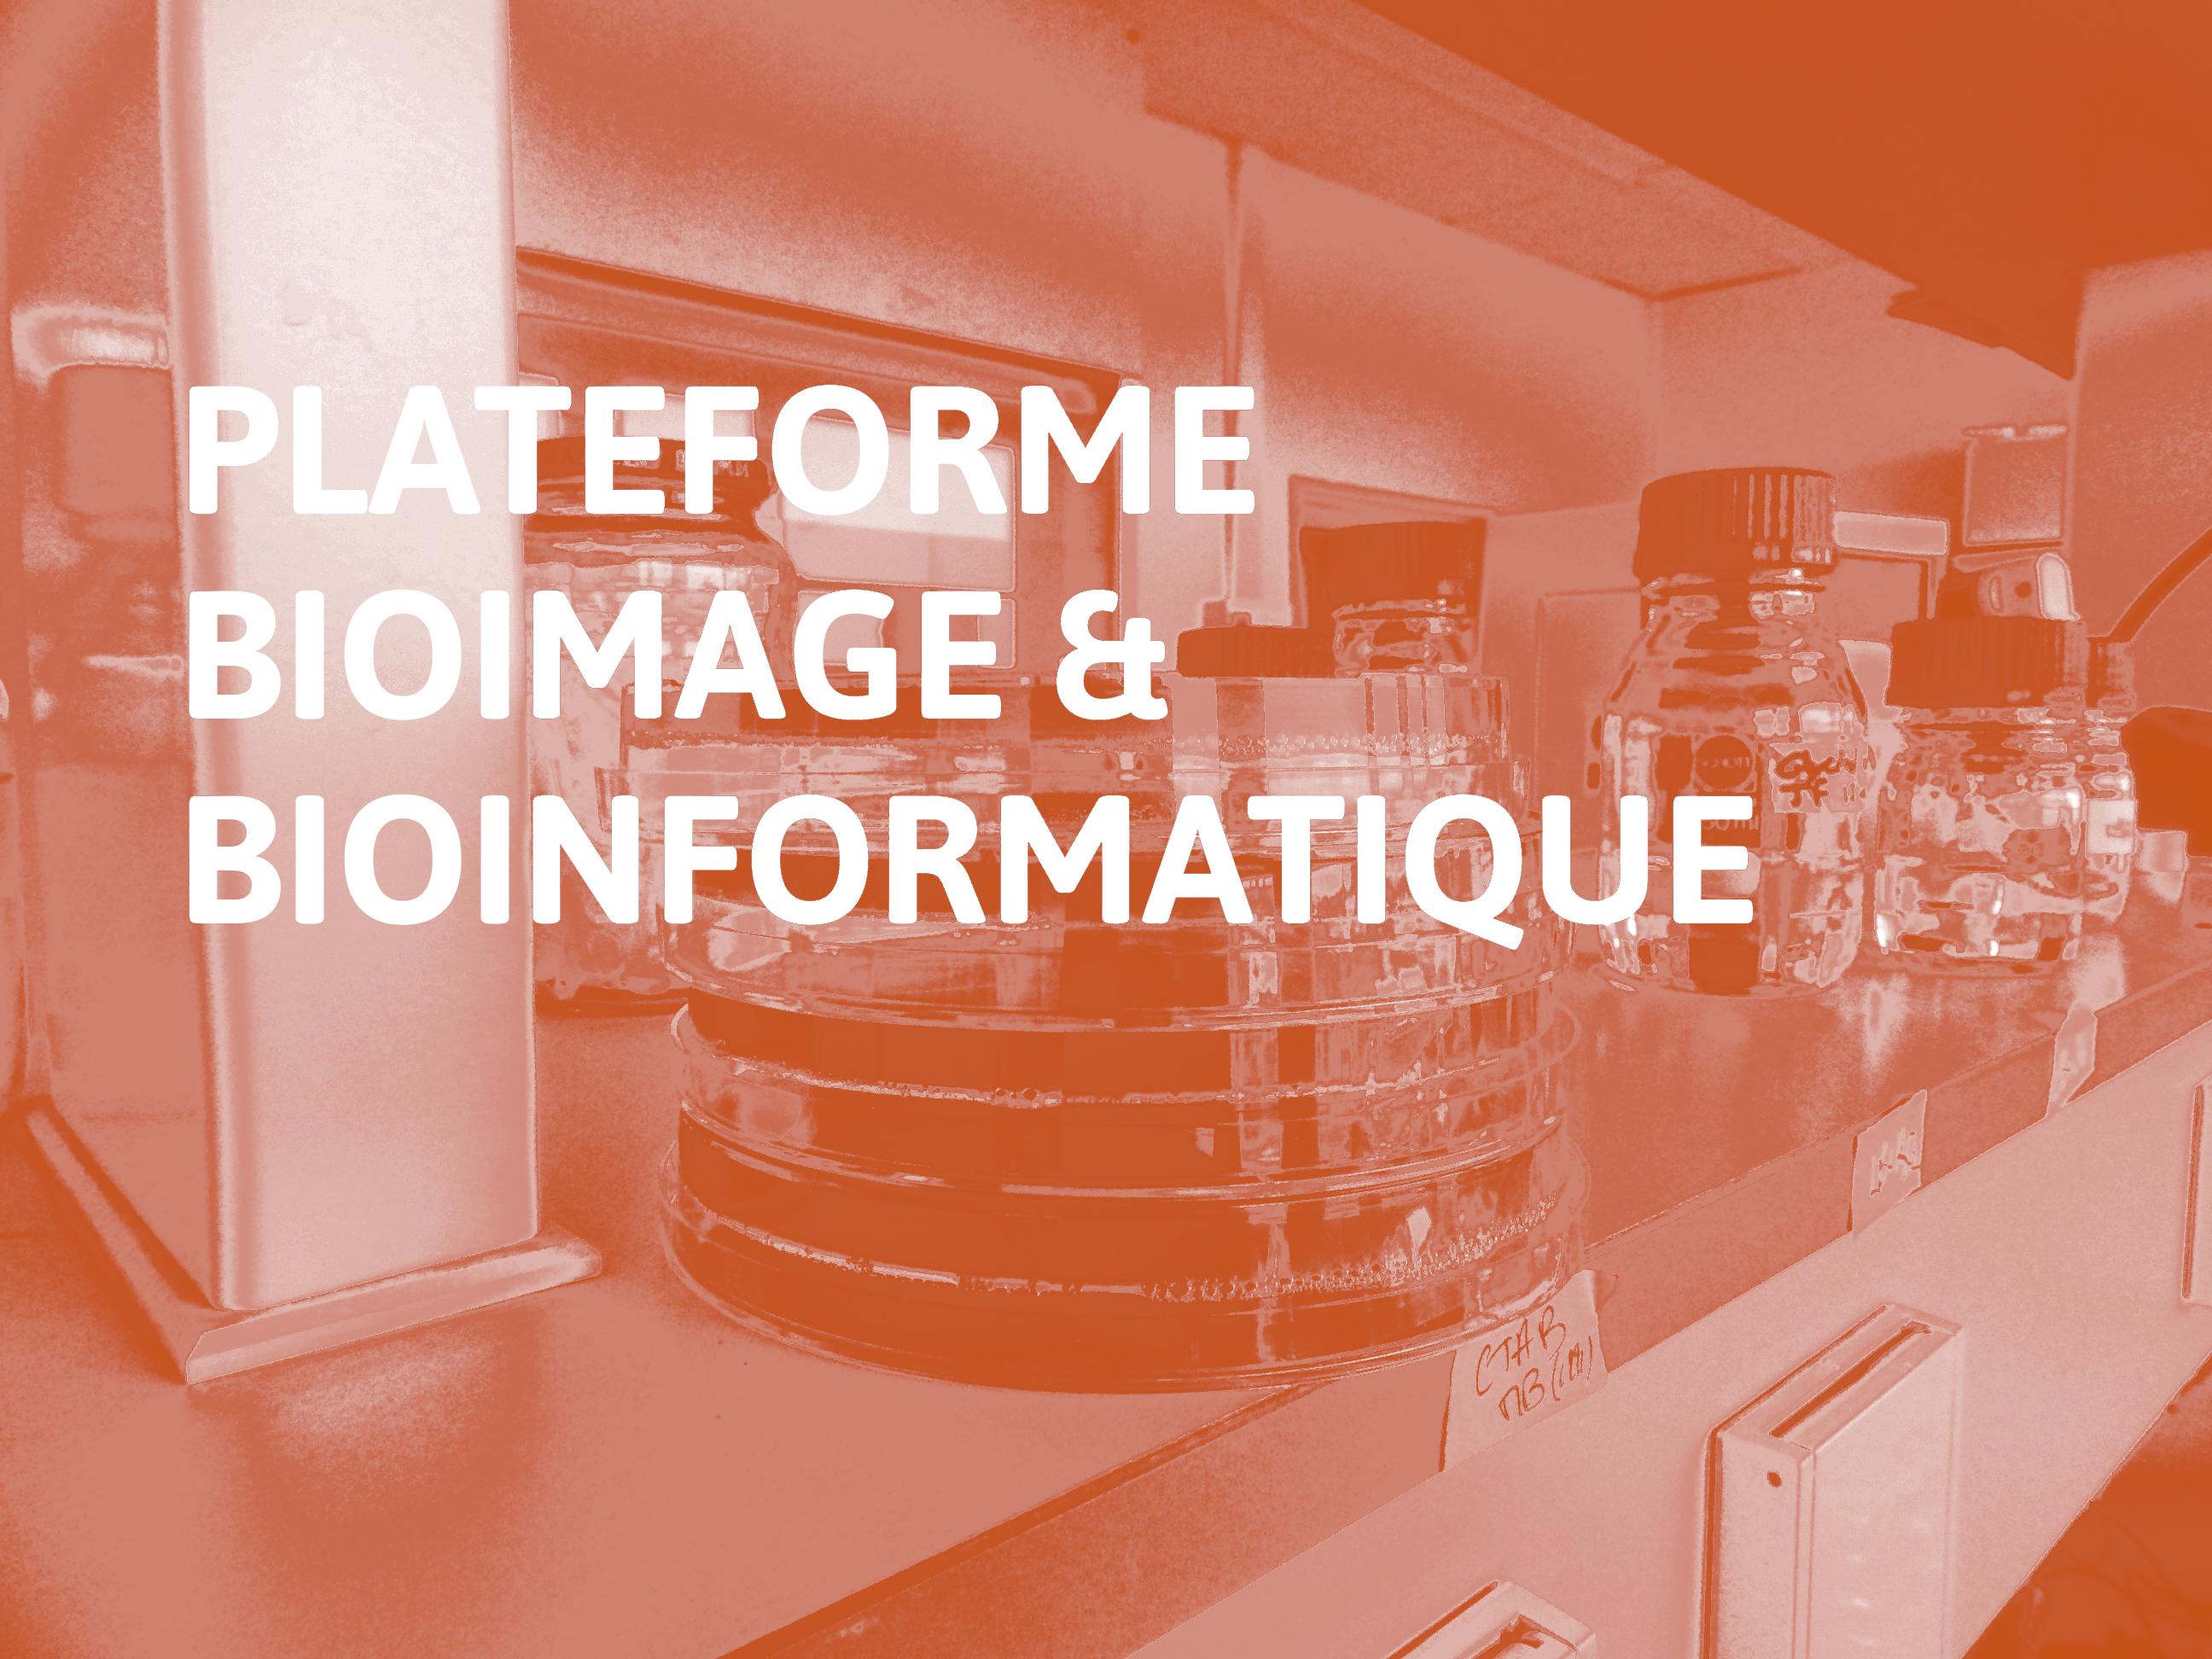 Plateforme Bioimage & Bioinformatique